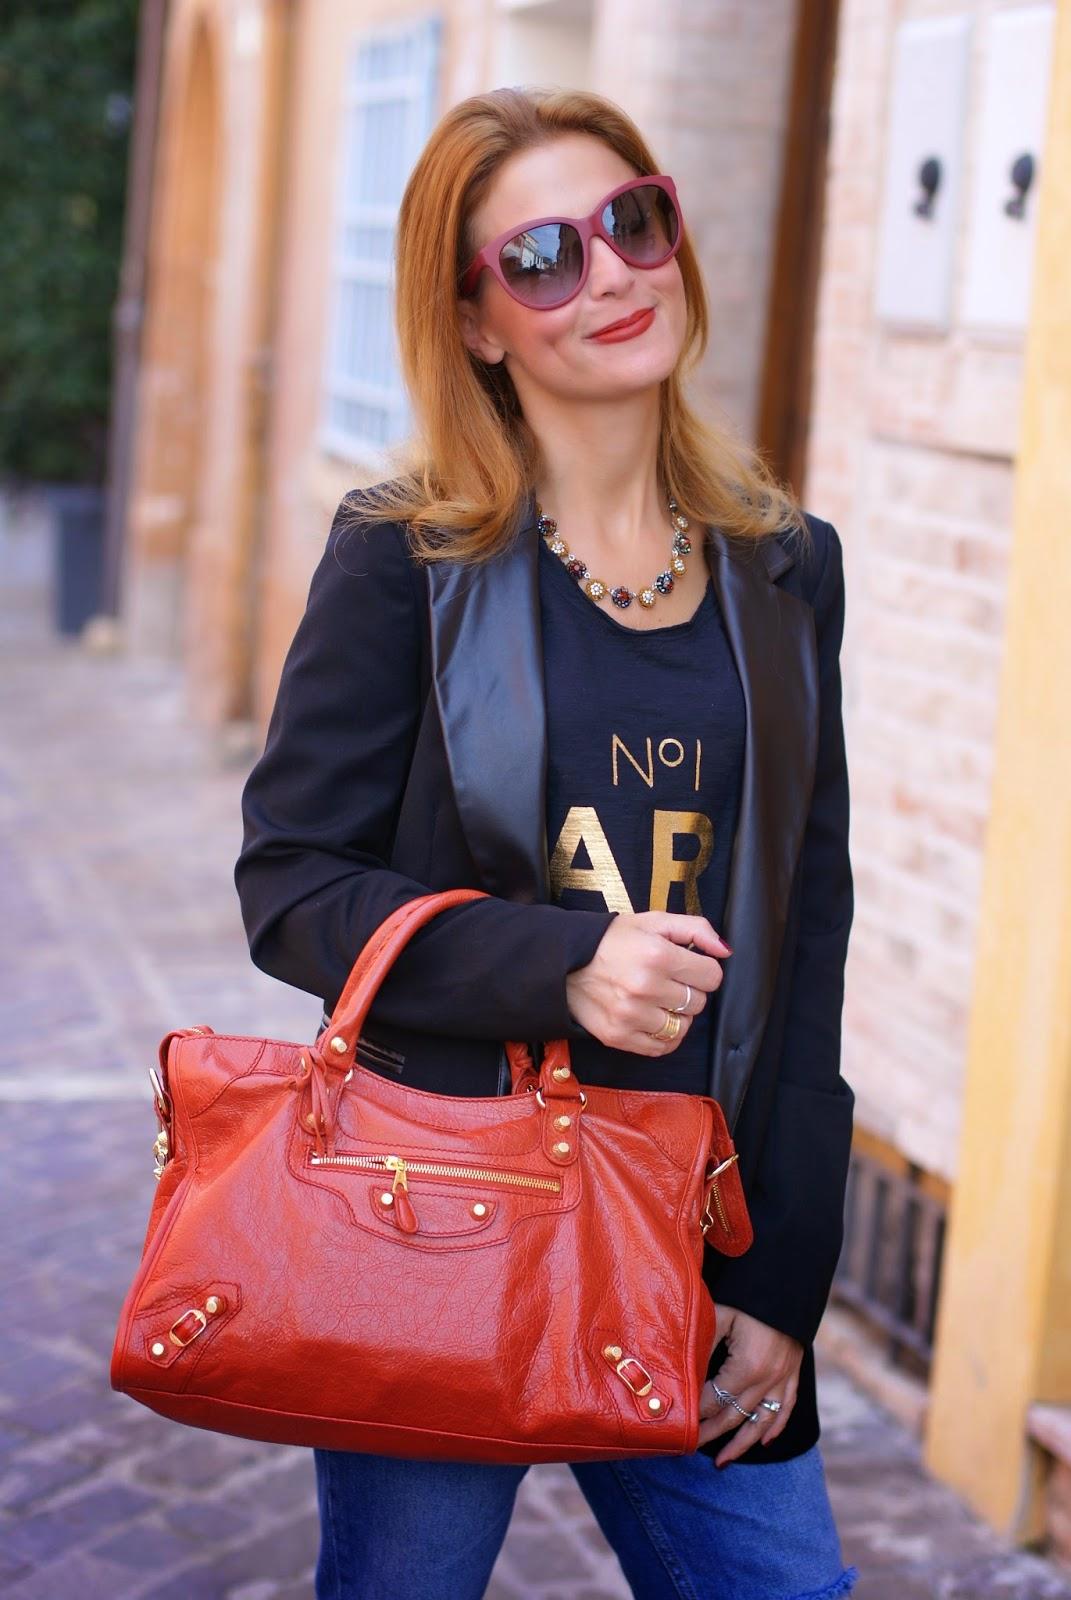 Sodini bijoux new fall winter collection, Balenciaga bag rouge ambre, Fashion and Cookies, fashion blogger